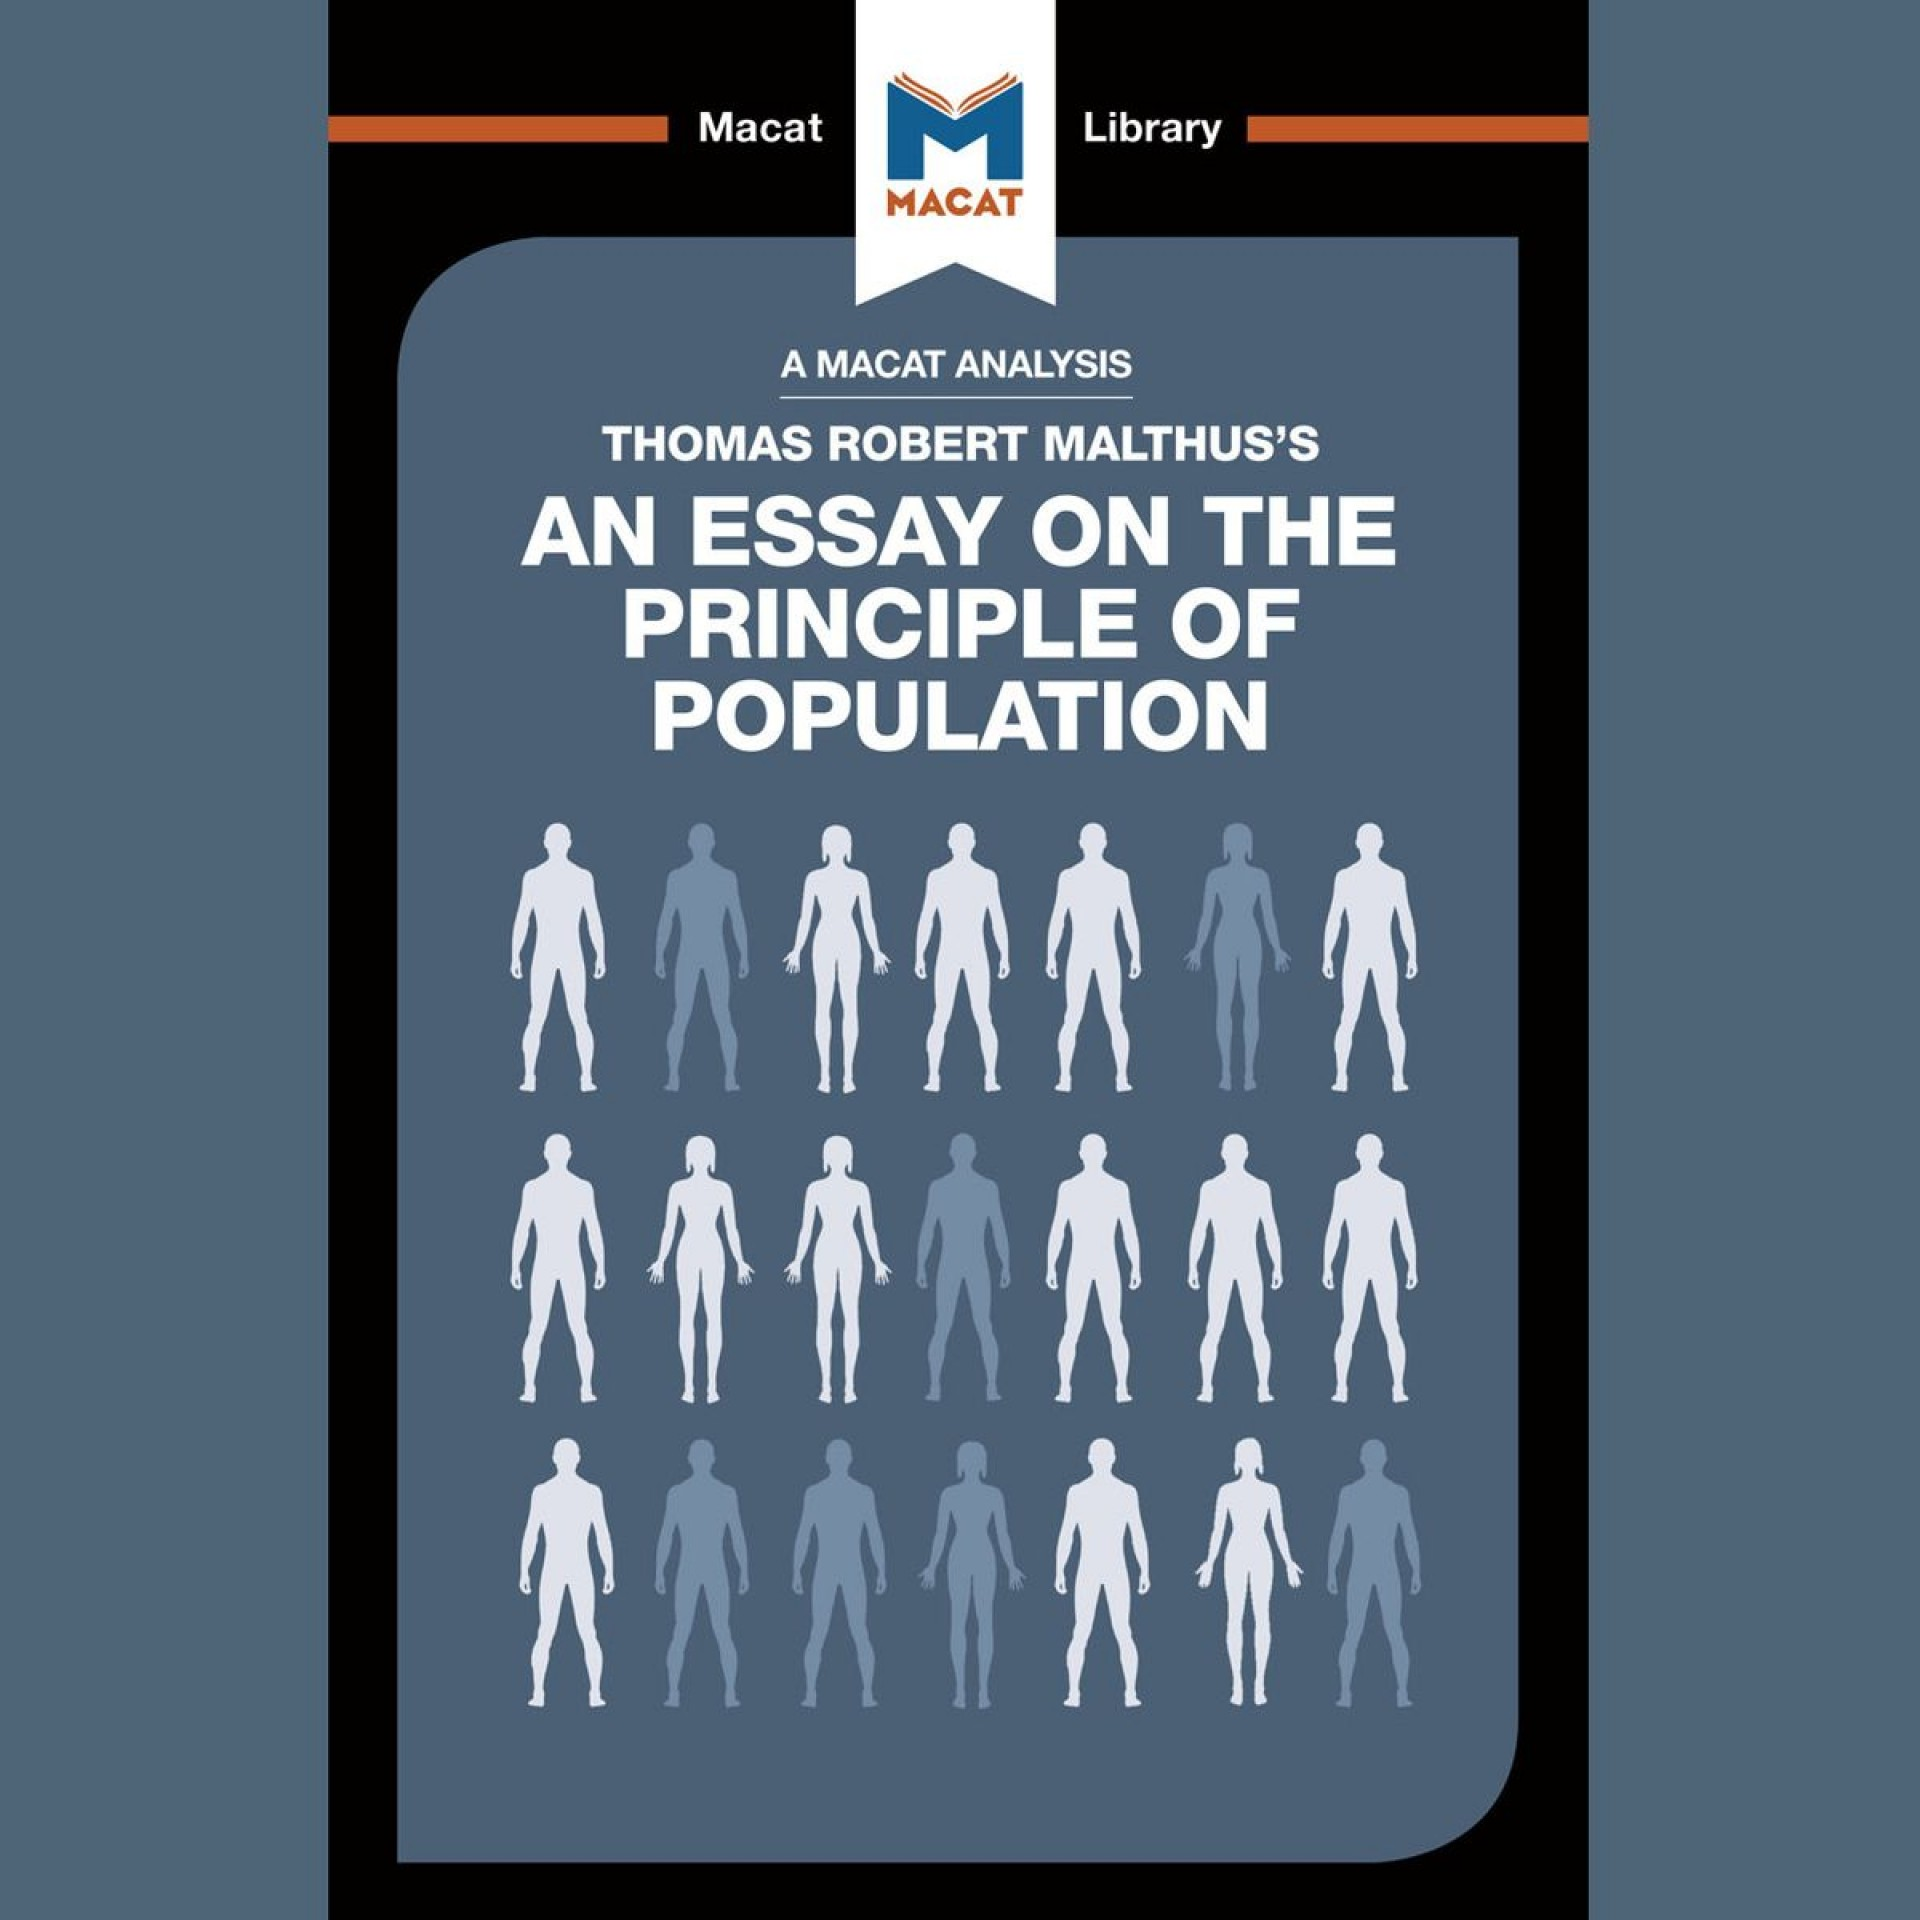 019 Thomas Robert Malthus An Essay On The Principle Of Population Stupendous After Reading Malthus's Principles Darwin Got Idea That Ap Euro 1920